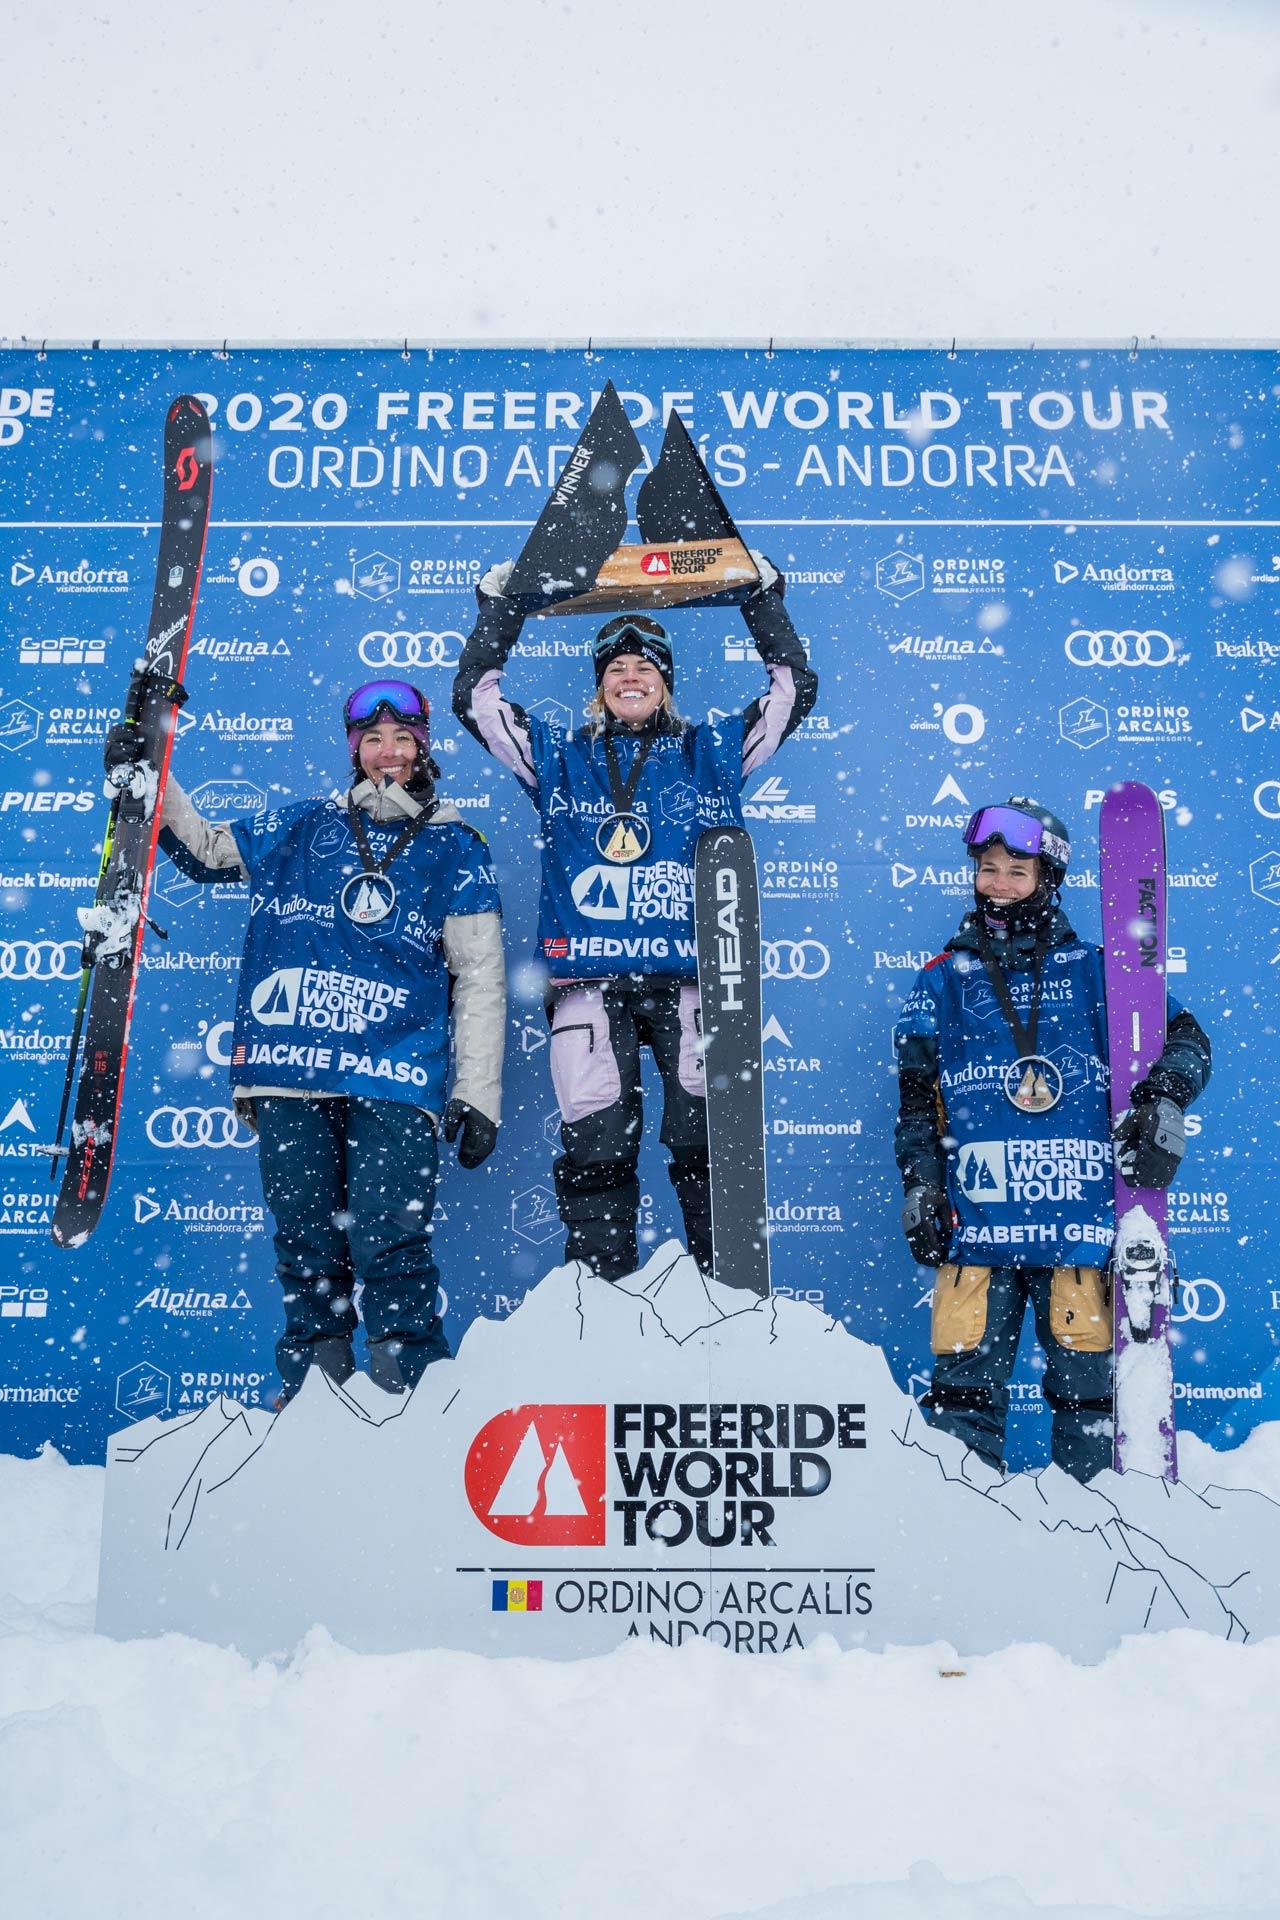 Das Podium der Frauen beim Freeride World Tour 2020 Contest in Andorra: Jaclyn Paaso (USA), Hedvig Wessel (NOR), Elisabeth Gerritzen (SUI) - Foto: freerideworldtour.com / J. Bernard